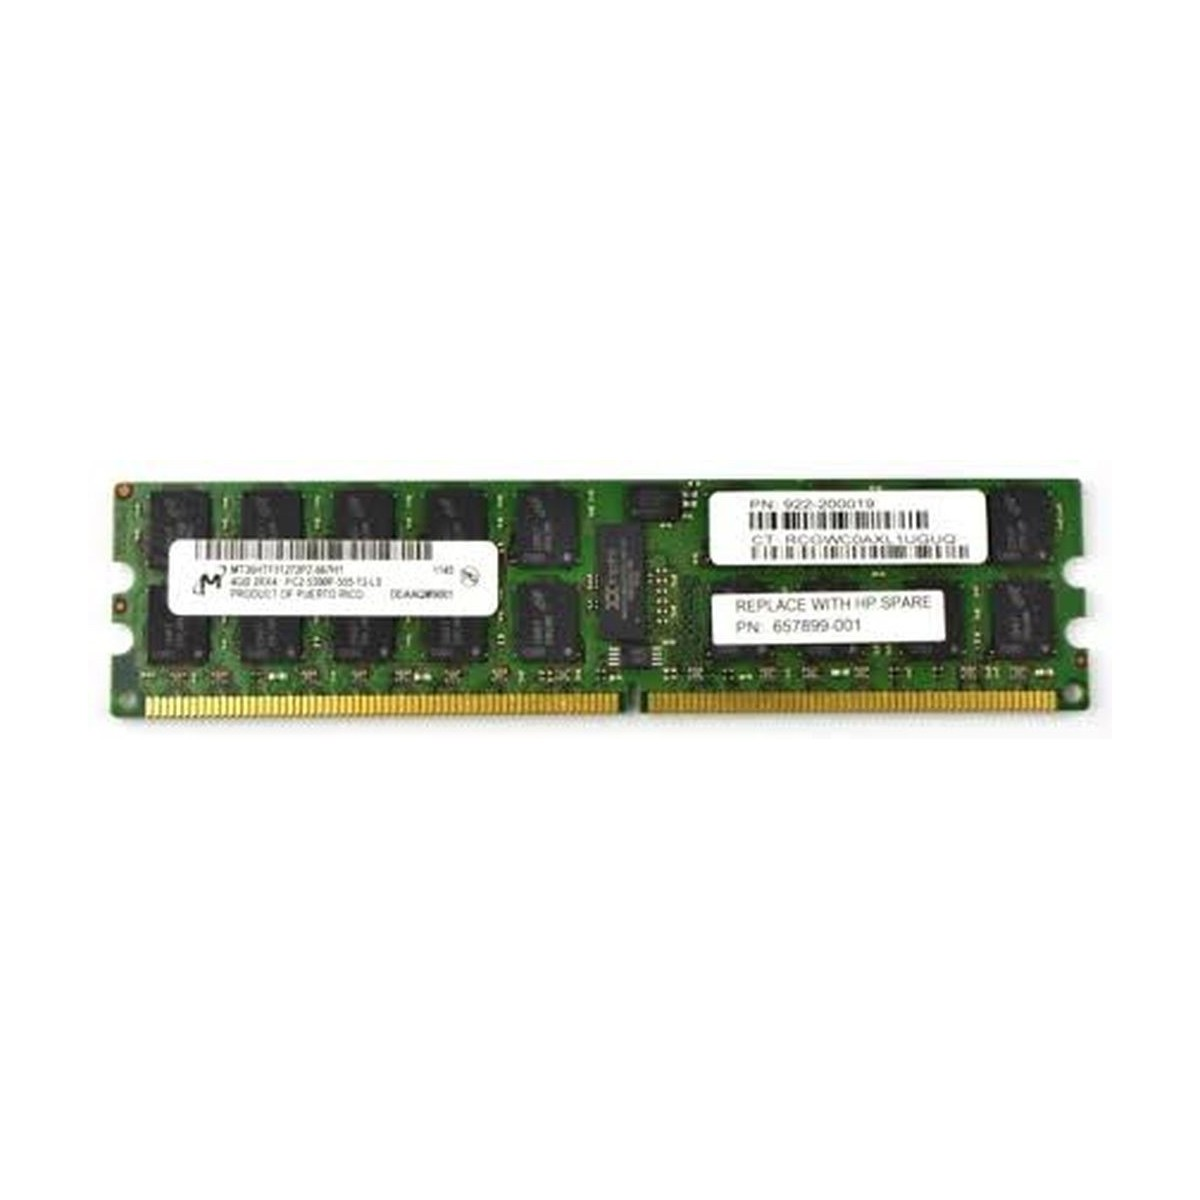 DYSK HP 146,8GB 15K U320 SCSI 443188-002 RAMKA